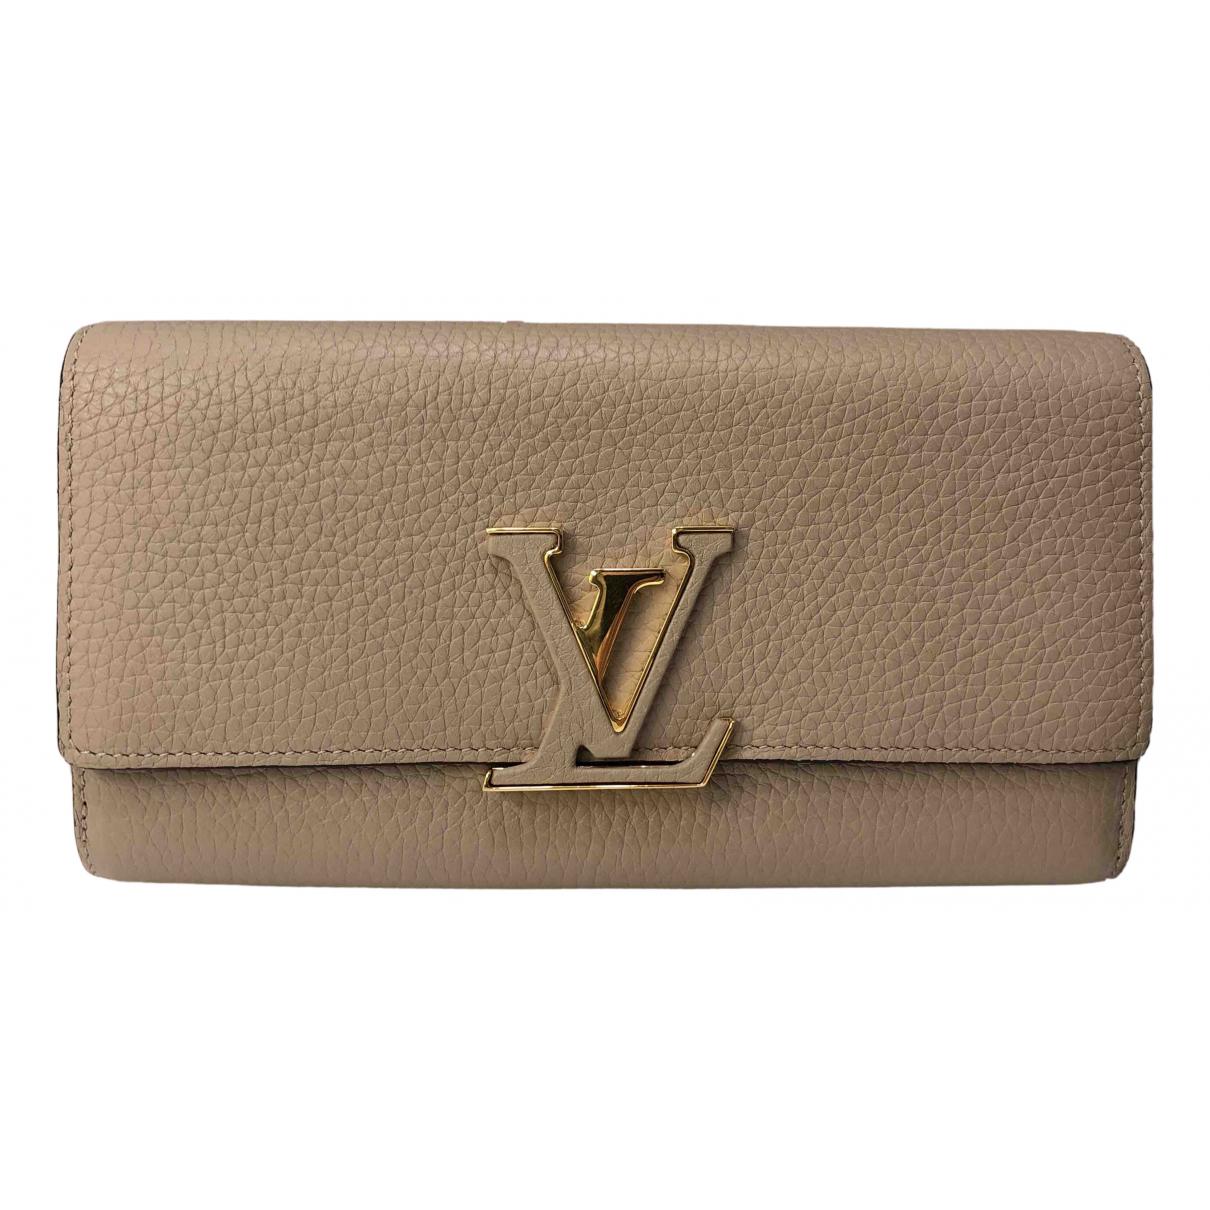 Louis Vuitton Capucines Beige Leather wallet for Women \N